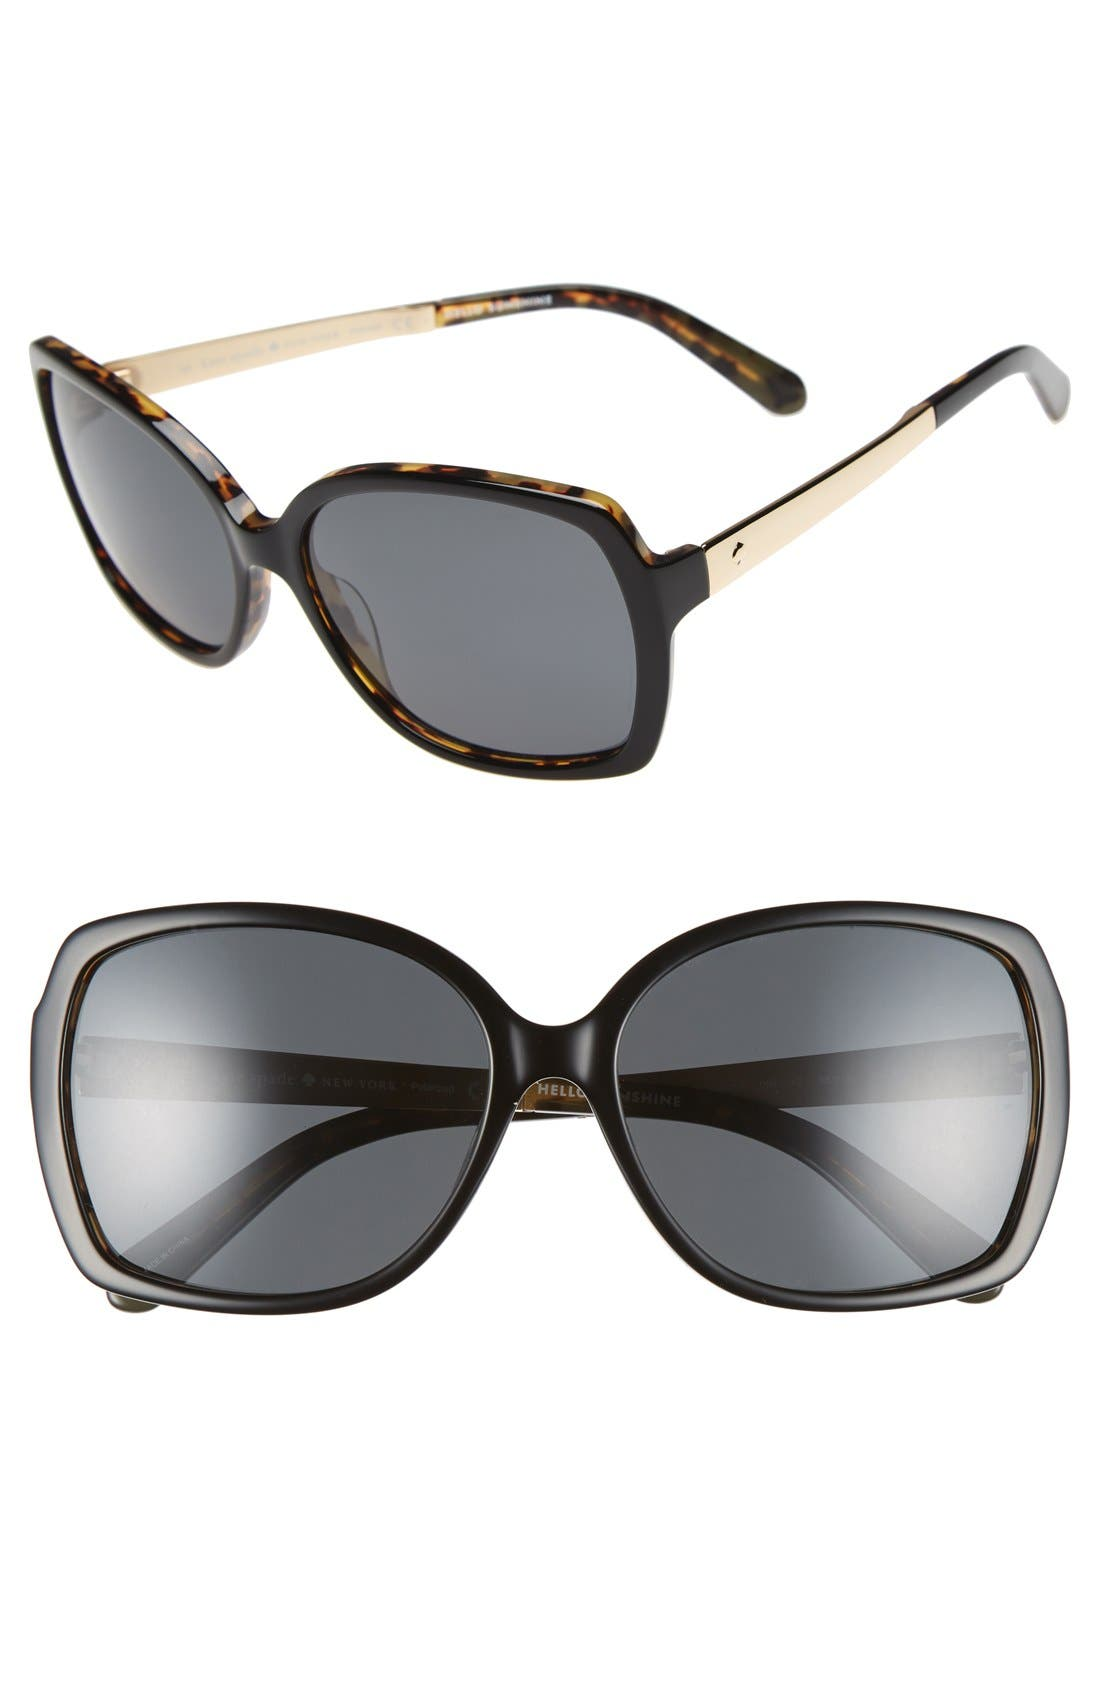 KATE SPADE NEW YORK 'darilynn' 58mm polarized sunglasses, Main, color, 001